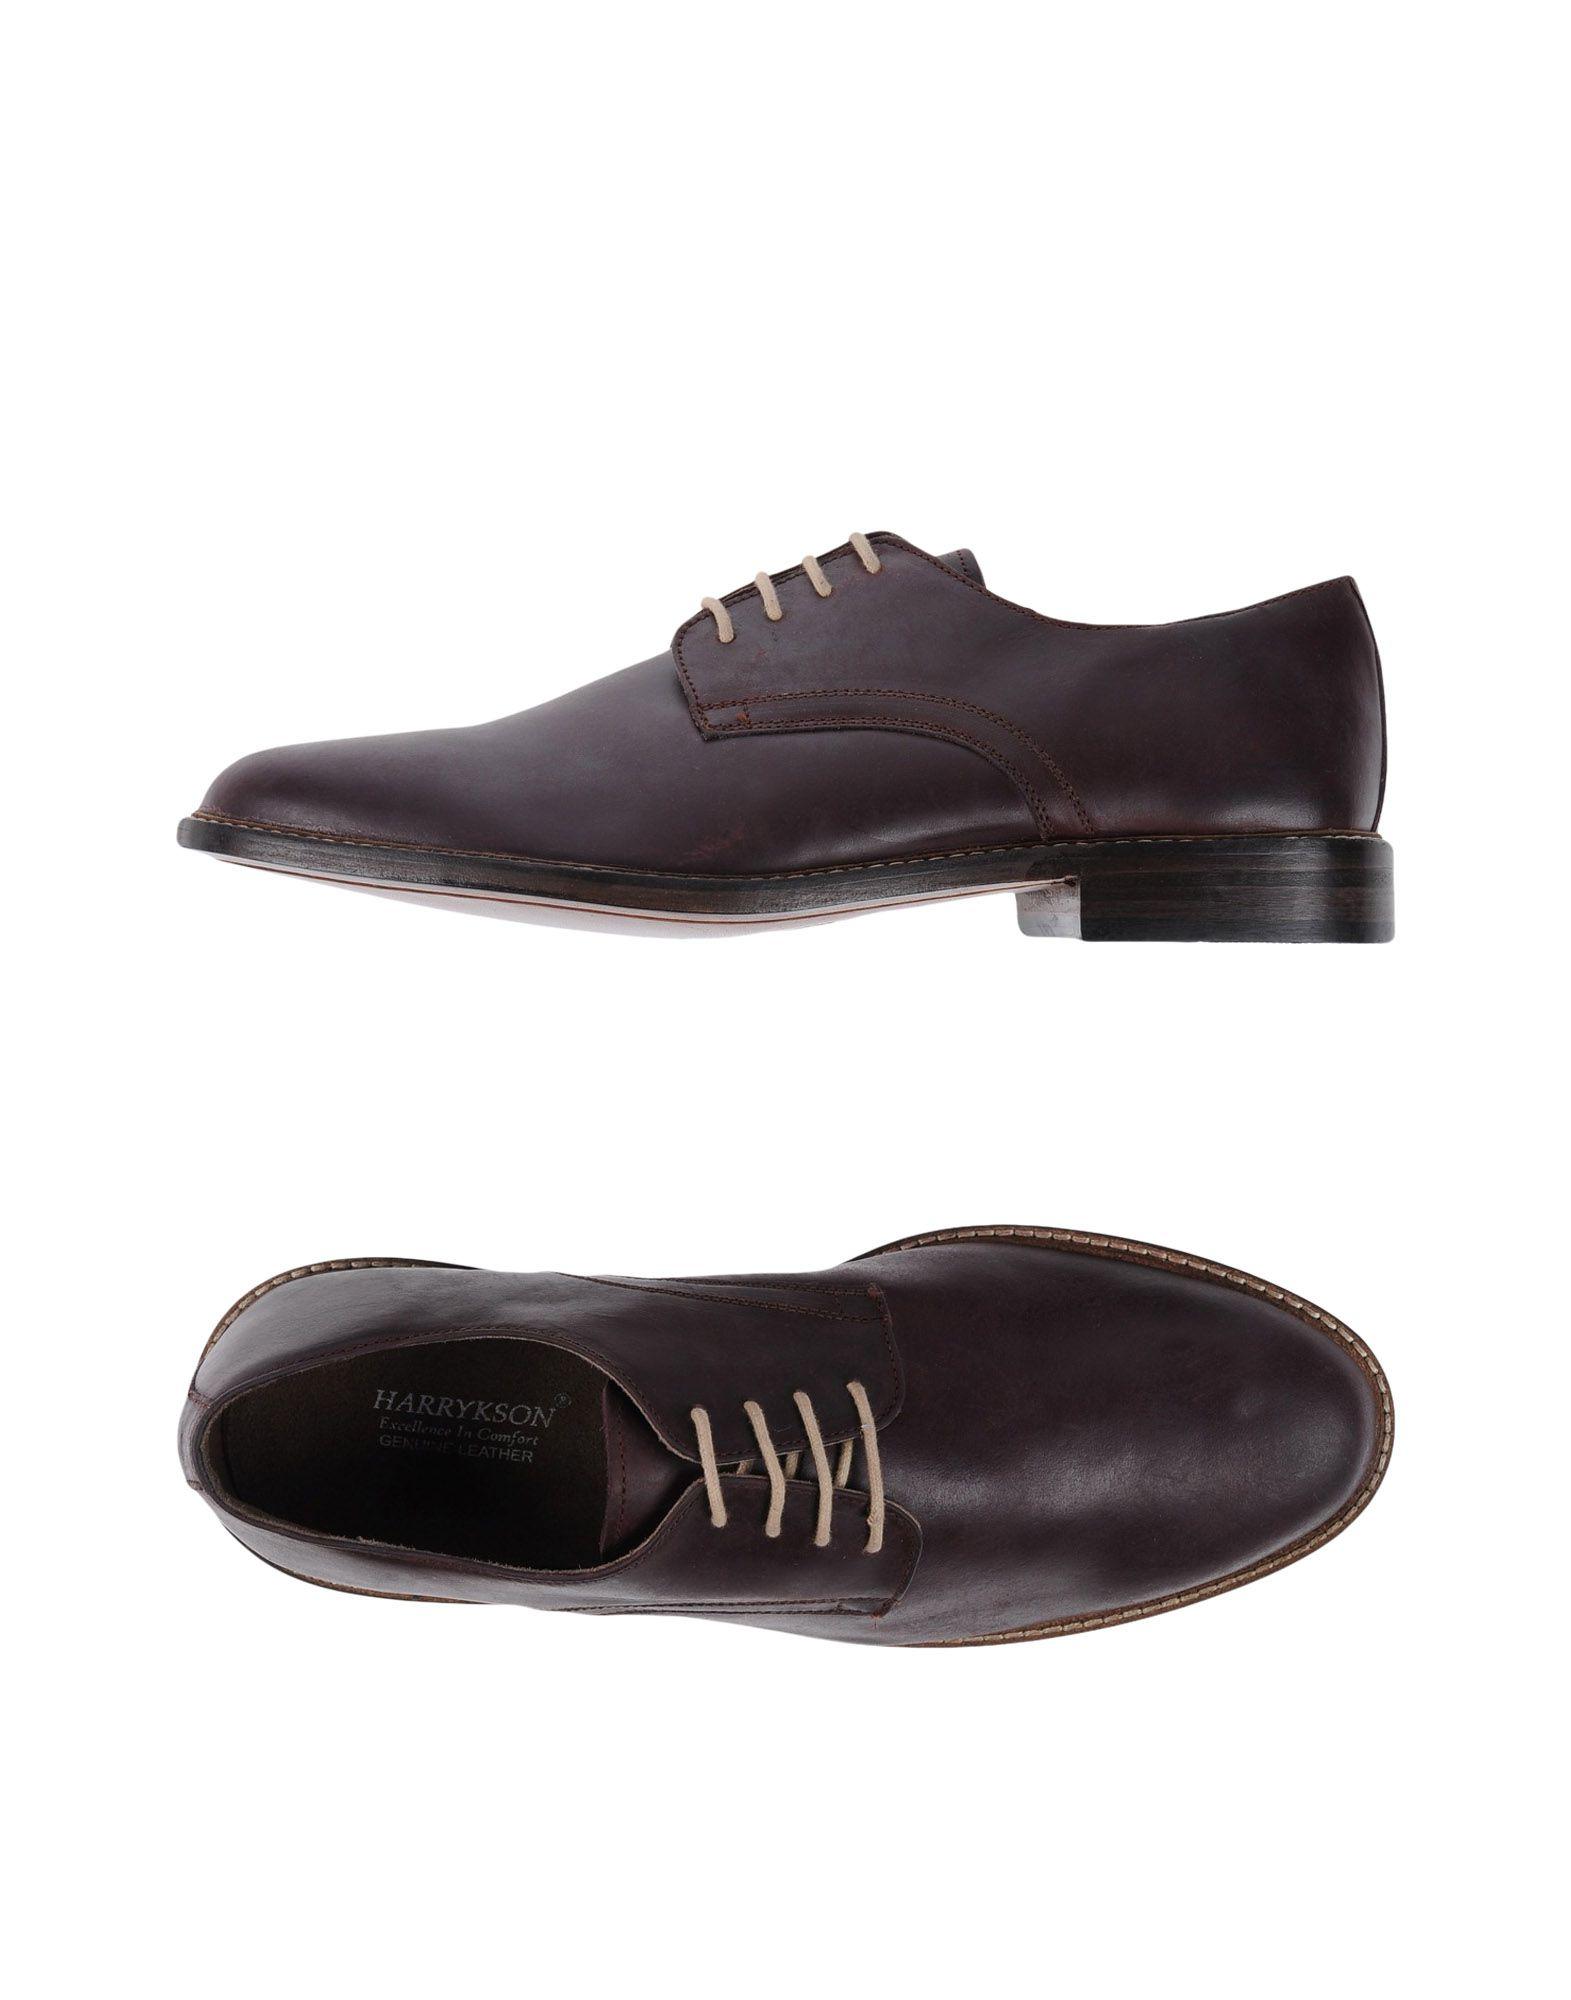 Rabatt echte Schuhe Harrykson® Schnürschuhe Herren  11075823PC